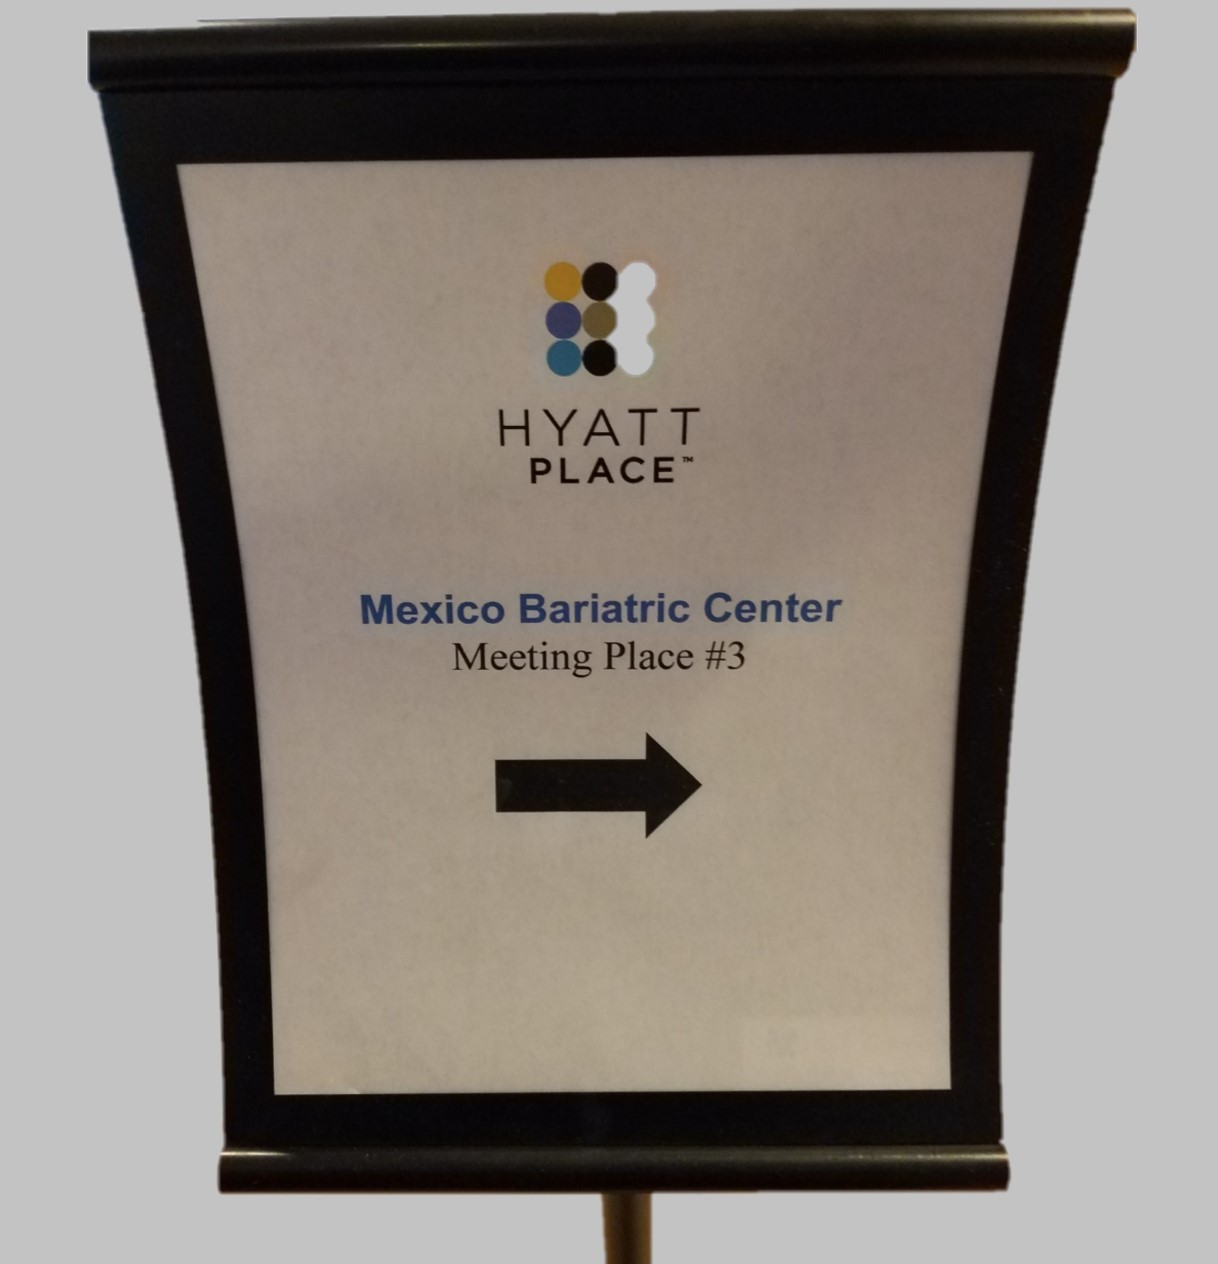 Oregon Bariatric Seminar - Portland Hyatt Place - Mexico Bariatric Center